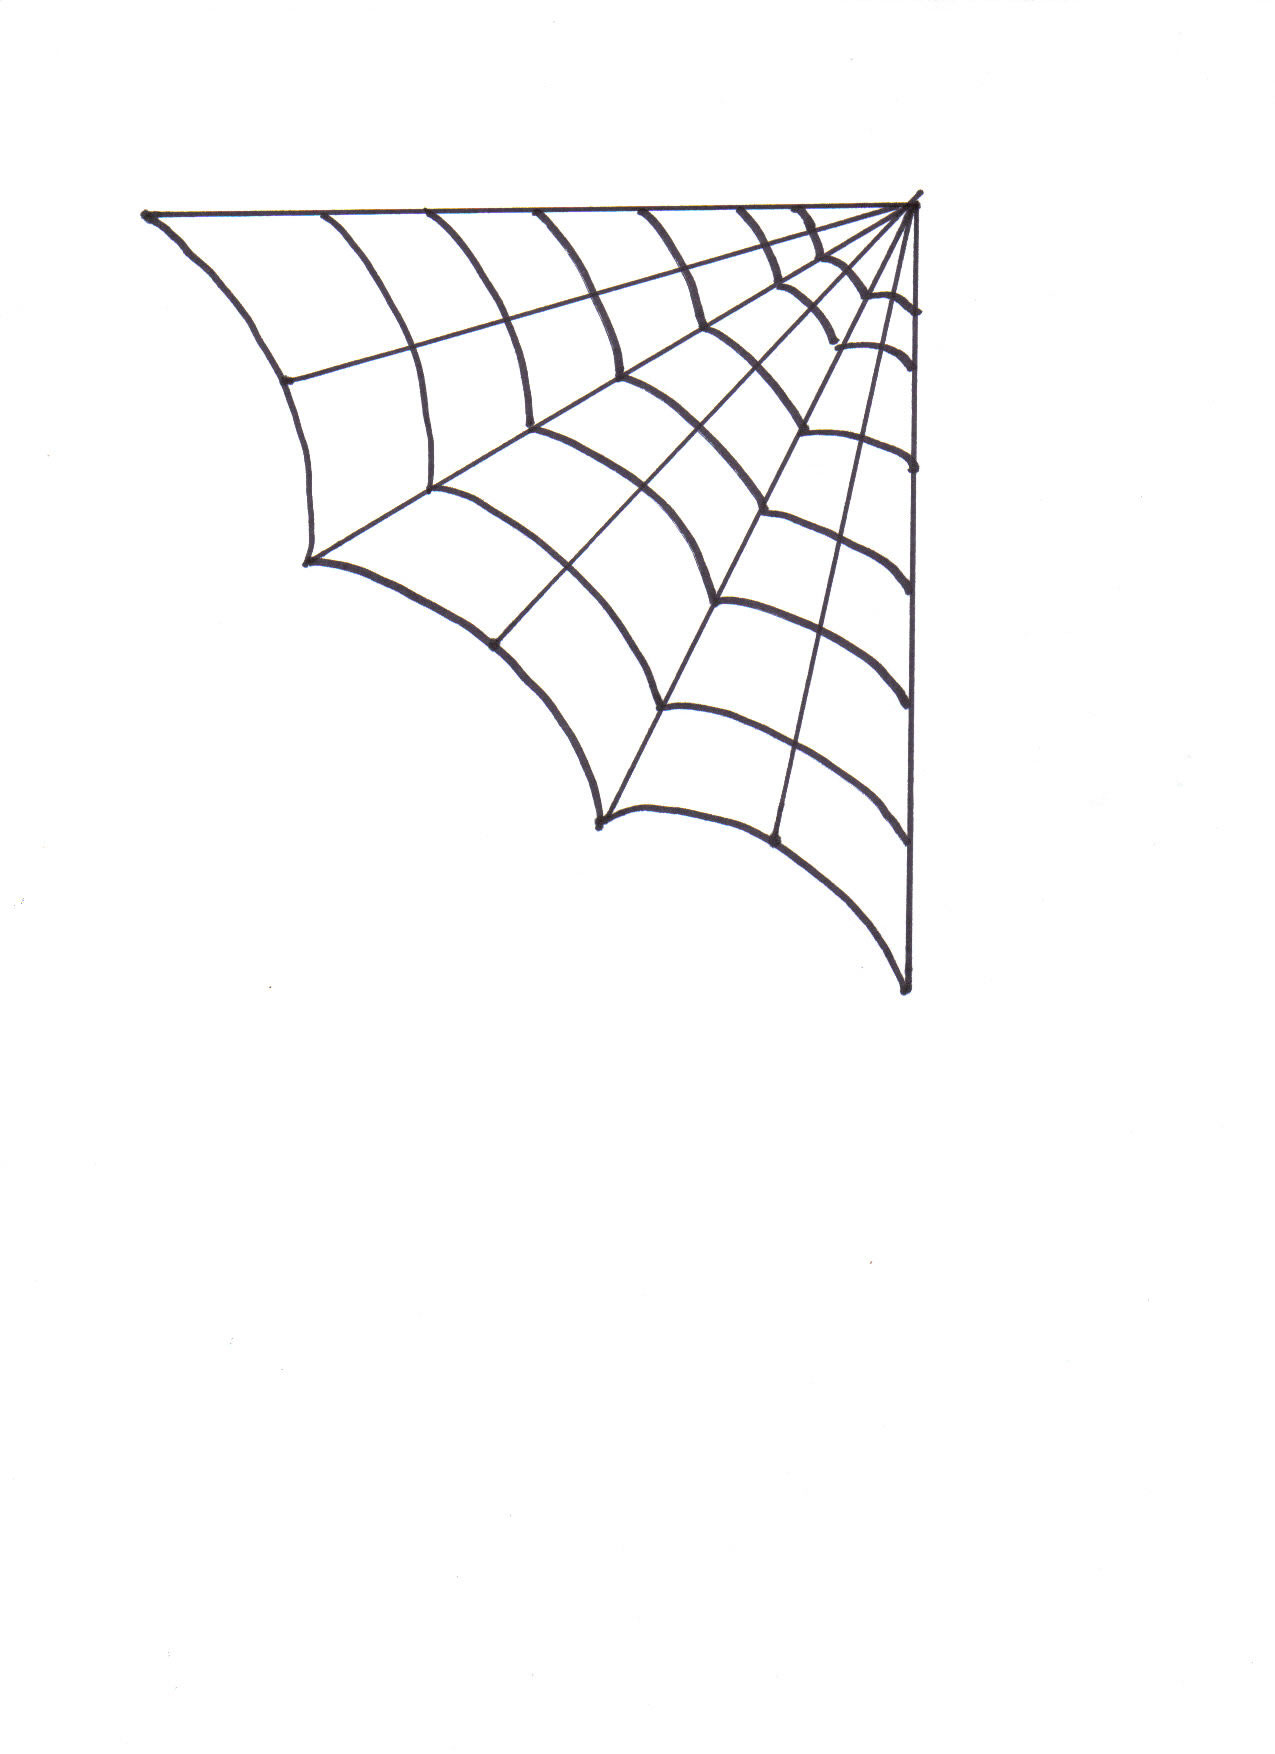 Corner spider web clipart black and white library Spider webrner clip art furthermore together we can do it clip ... black and white library